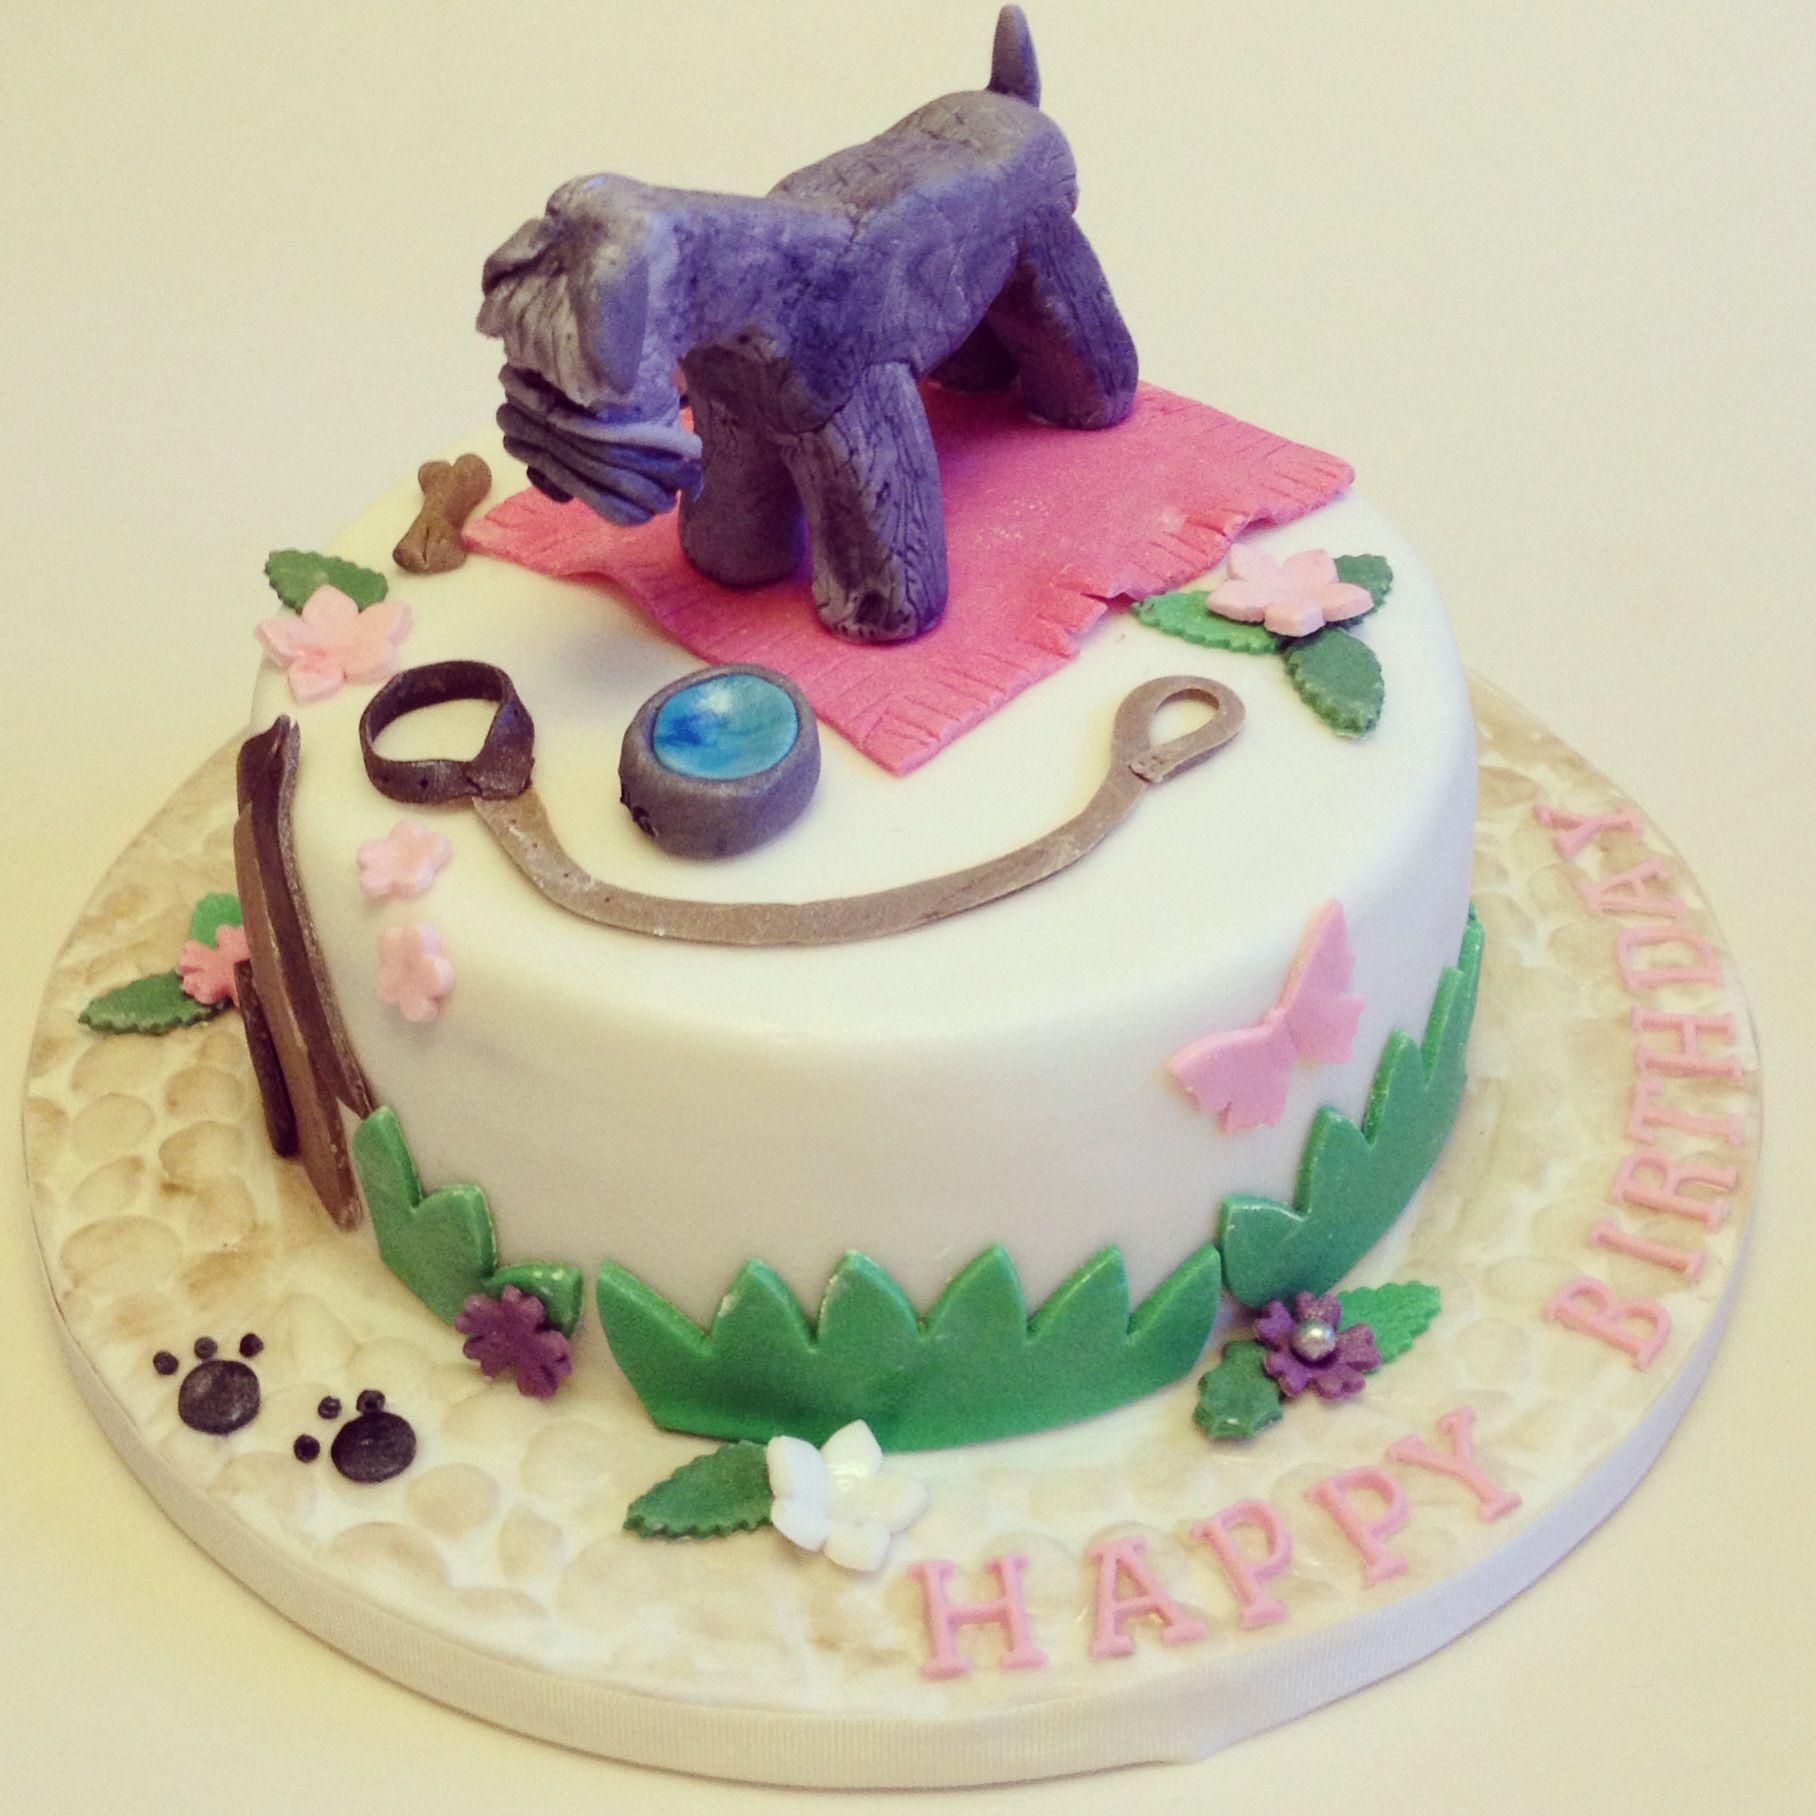 Schnauzer dog cake Food Pics for CatsterDogster Pinterest